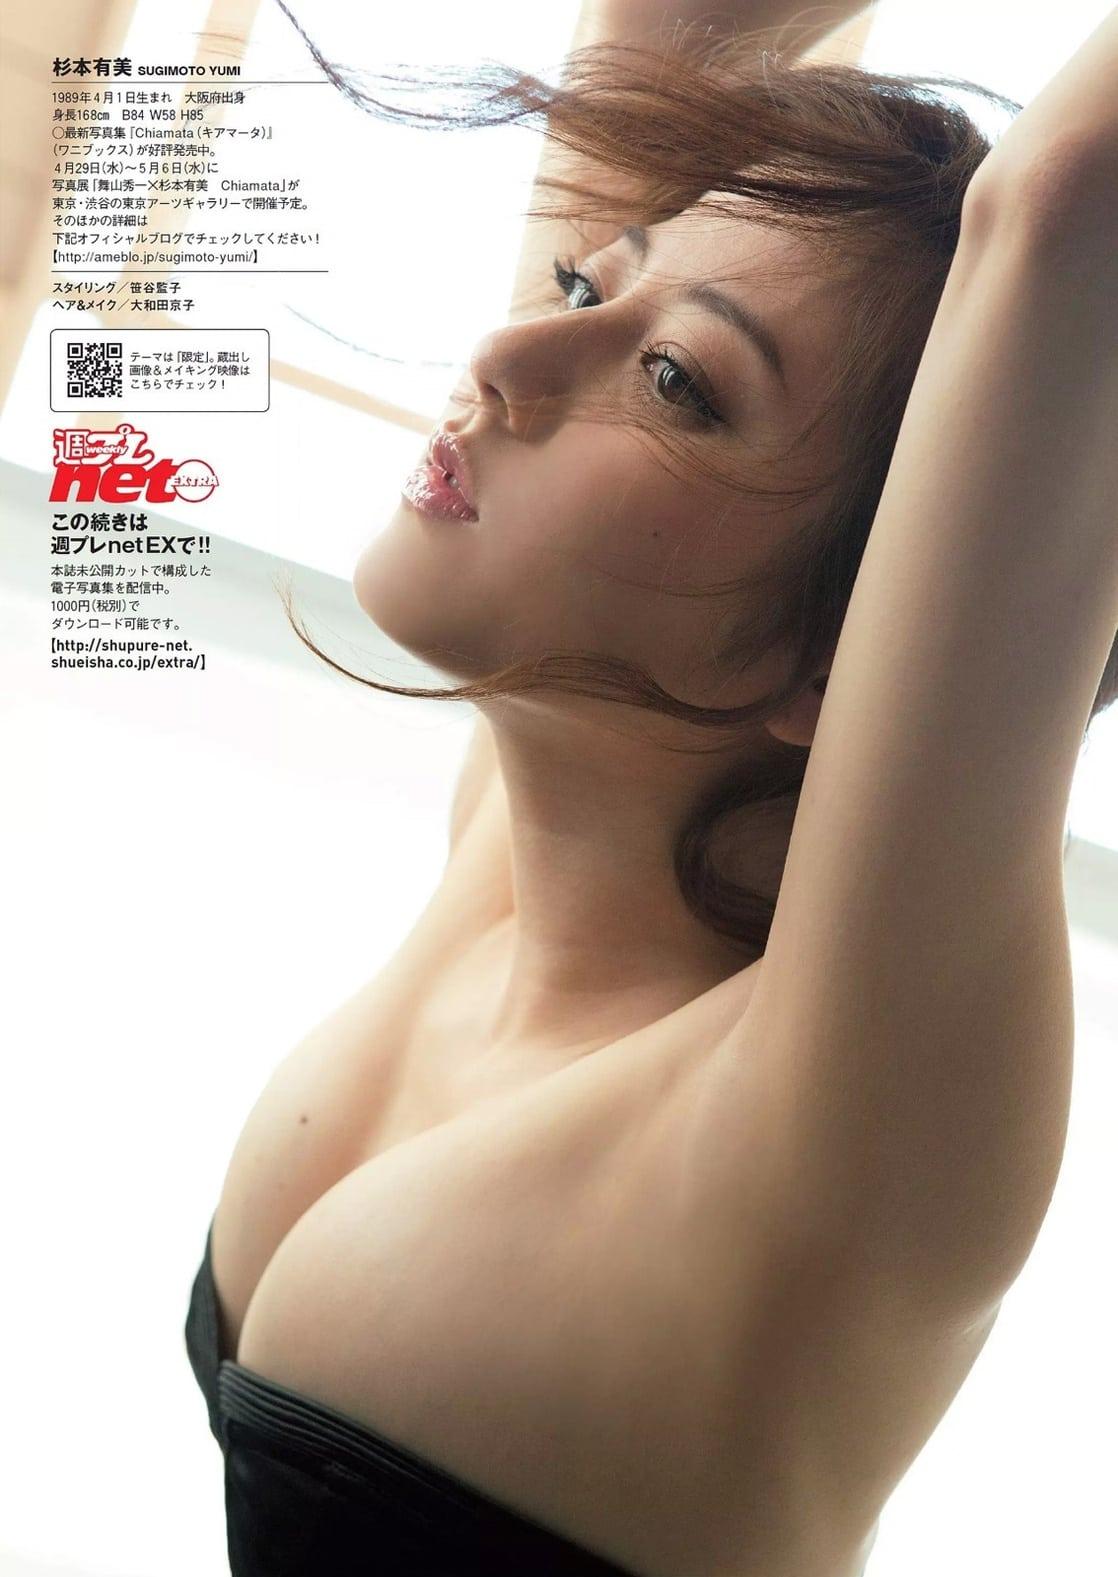 Lauren LoGiudice,Anna May Wong XXX pic Virginia Huston,Gilda Galan